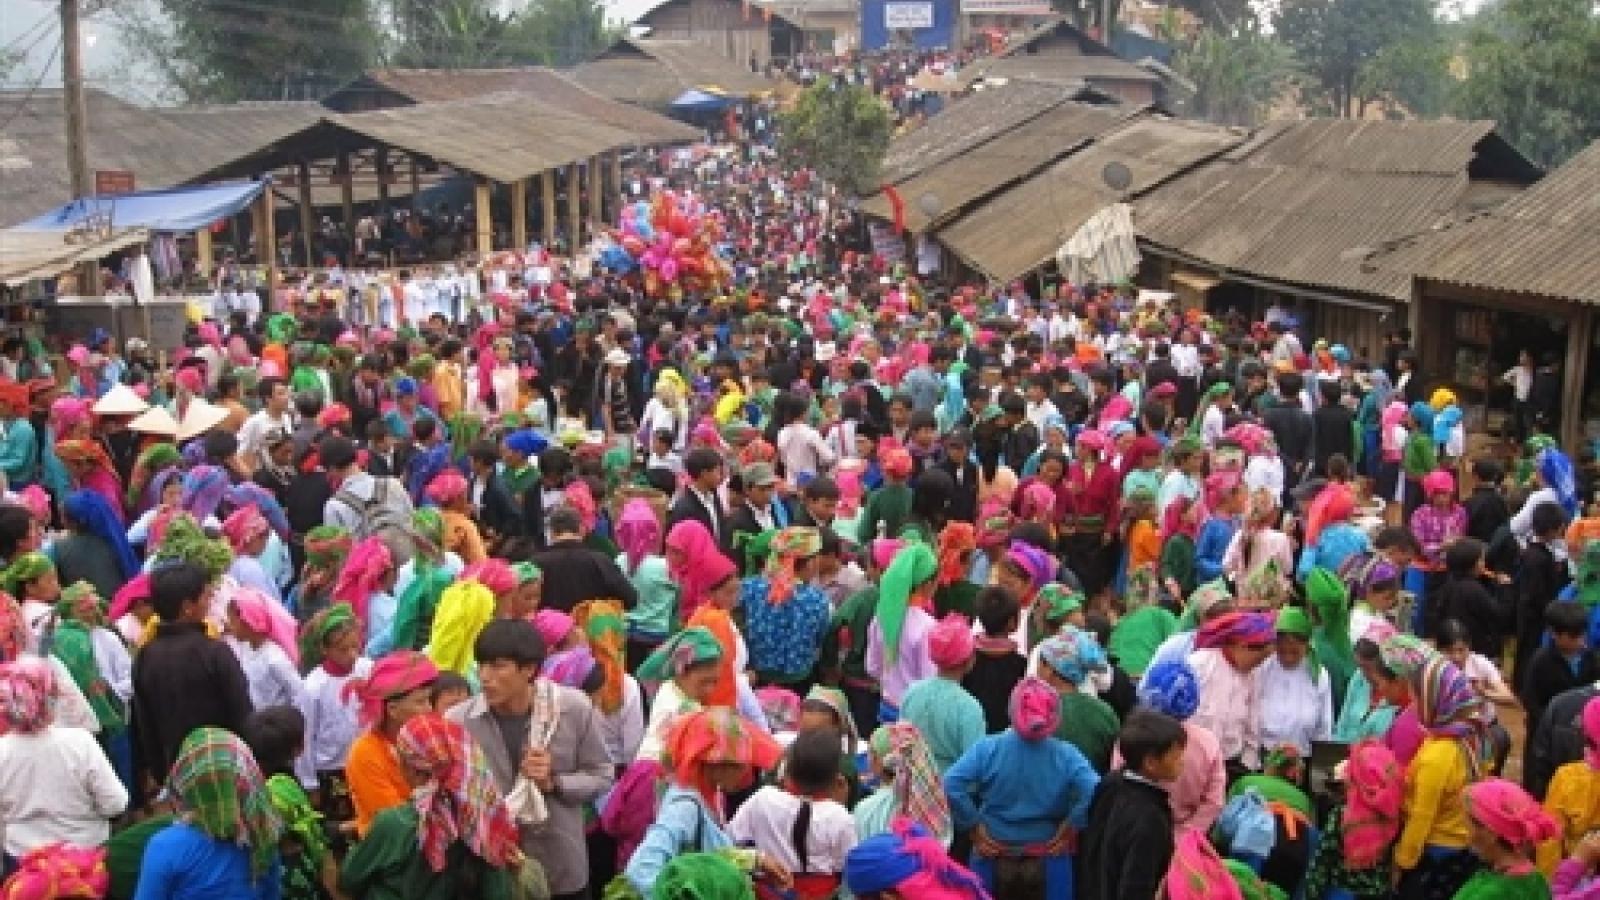 Khau Vai love market culture- tourism week celebrates Ha Giang culture